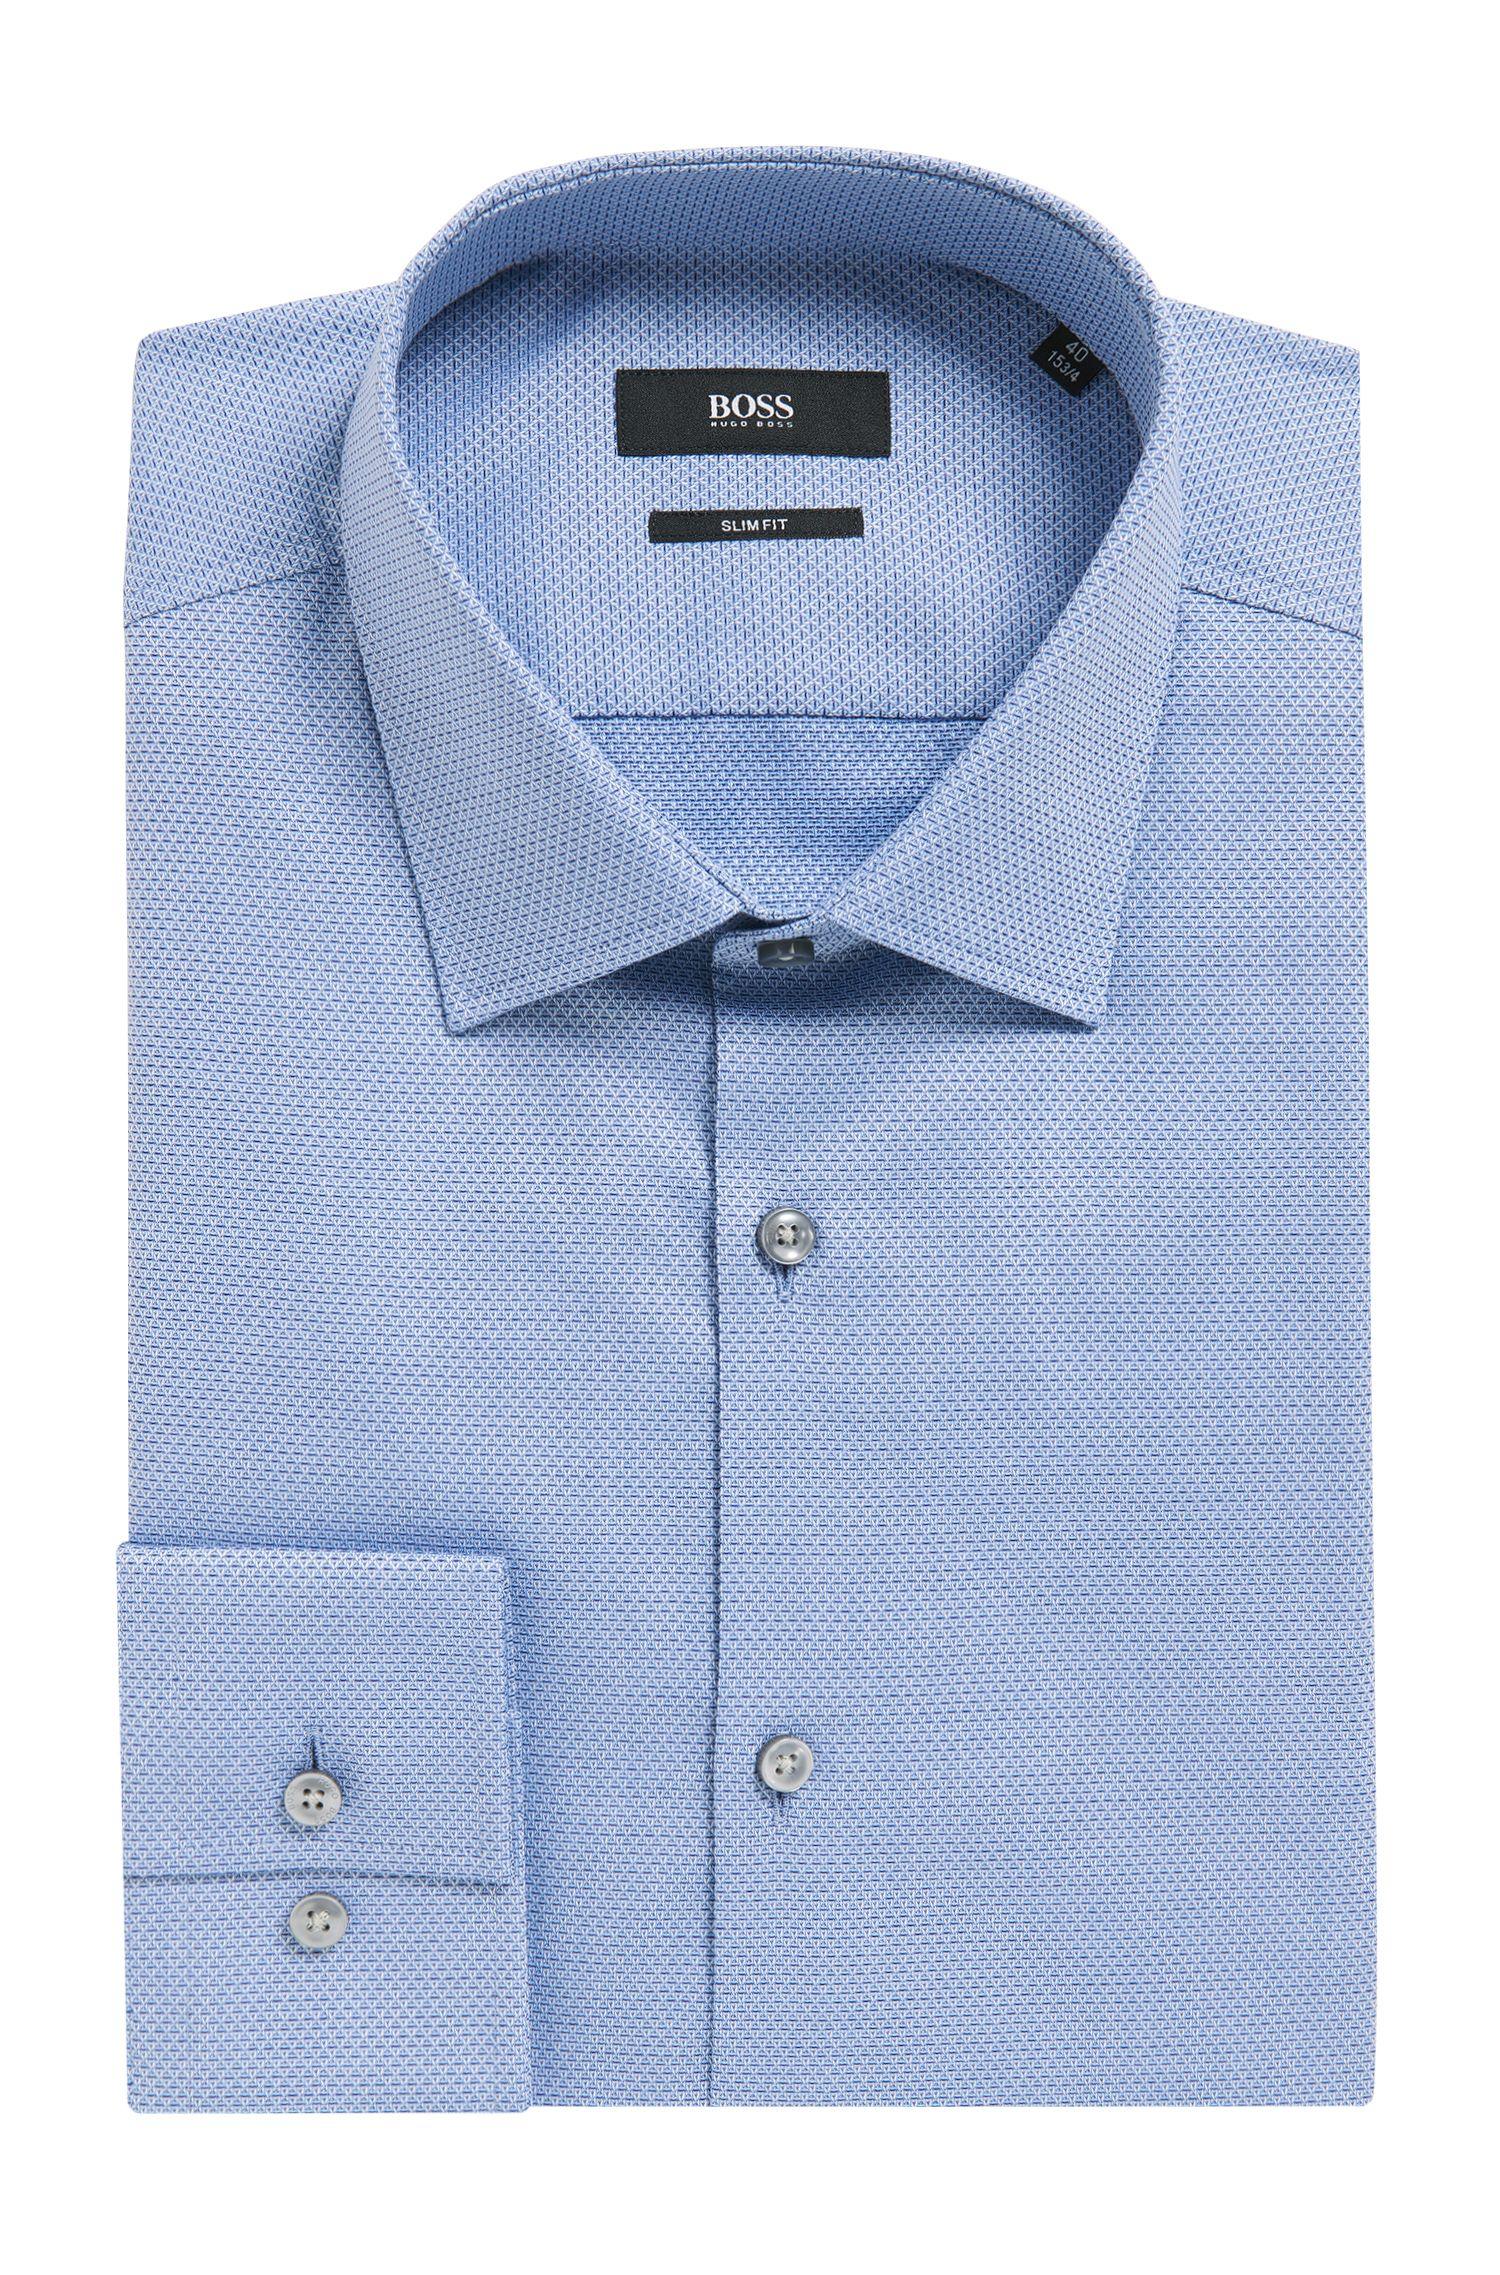 'Jenno'   Slim Fit, Diamond Print Cotton Dress Shirt